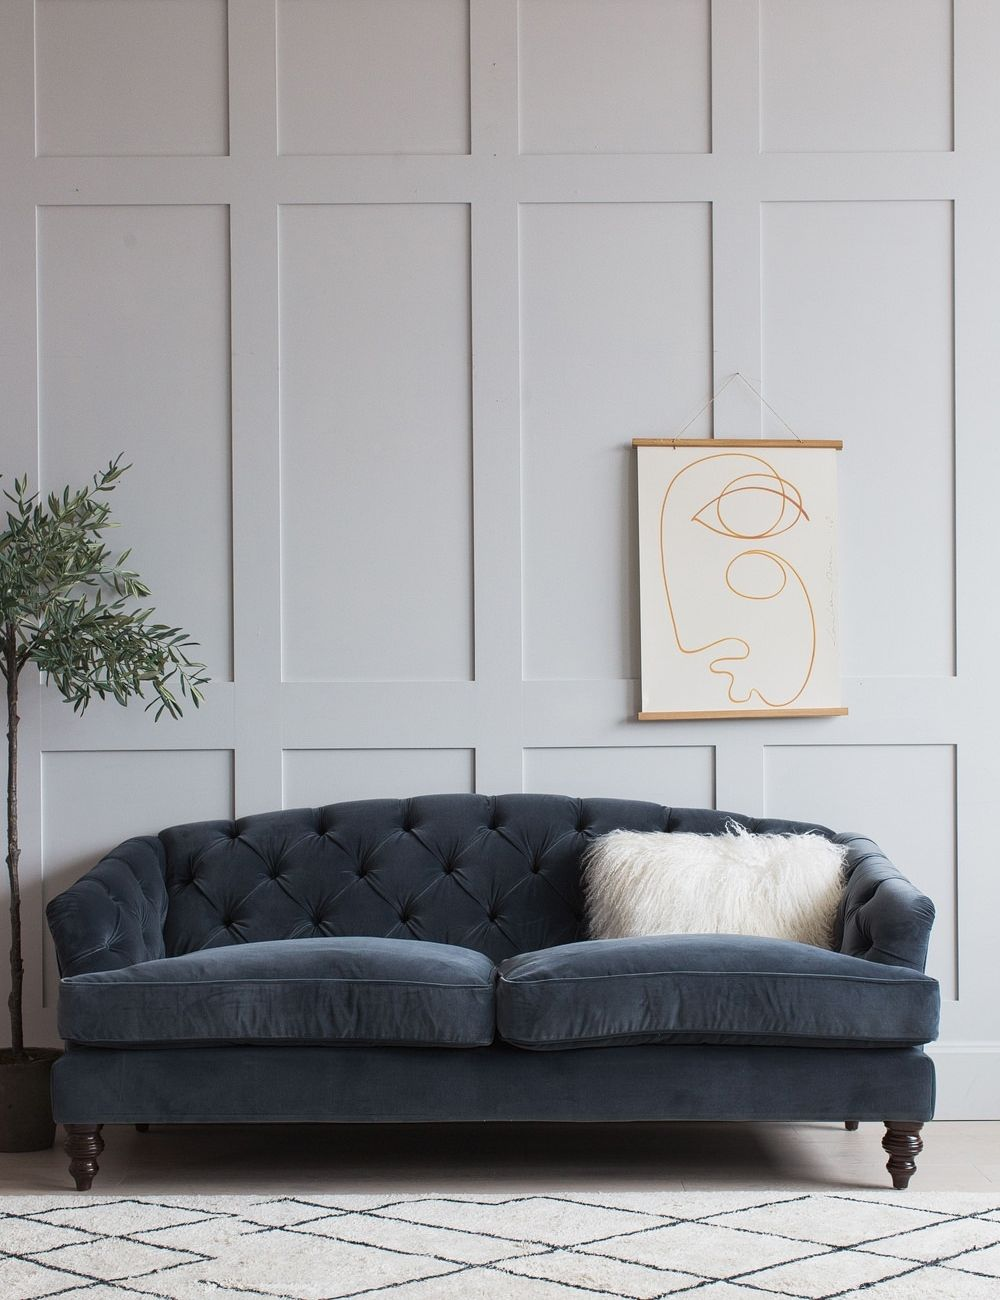 Harry Chesterfield Sofa Chesterfield Sofa Furniture Velvet Furniture